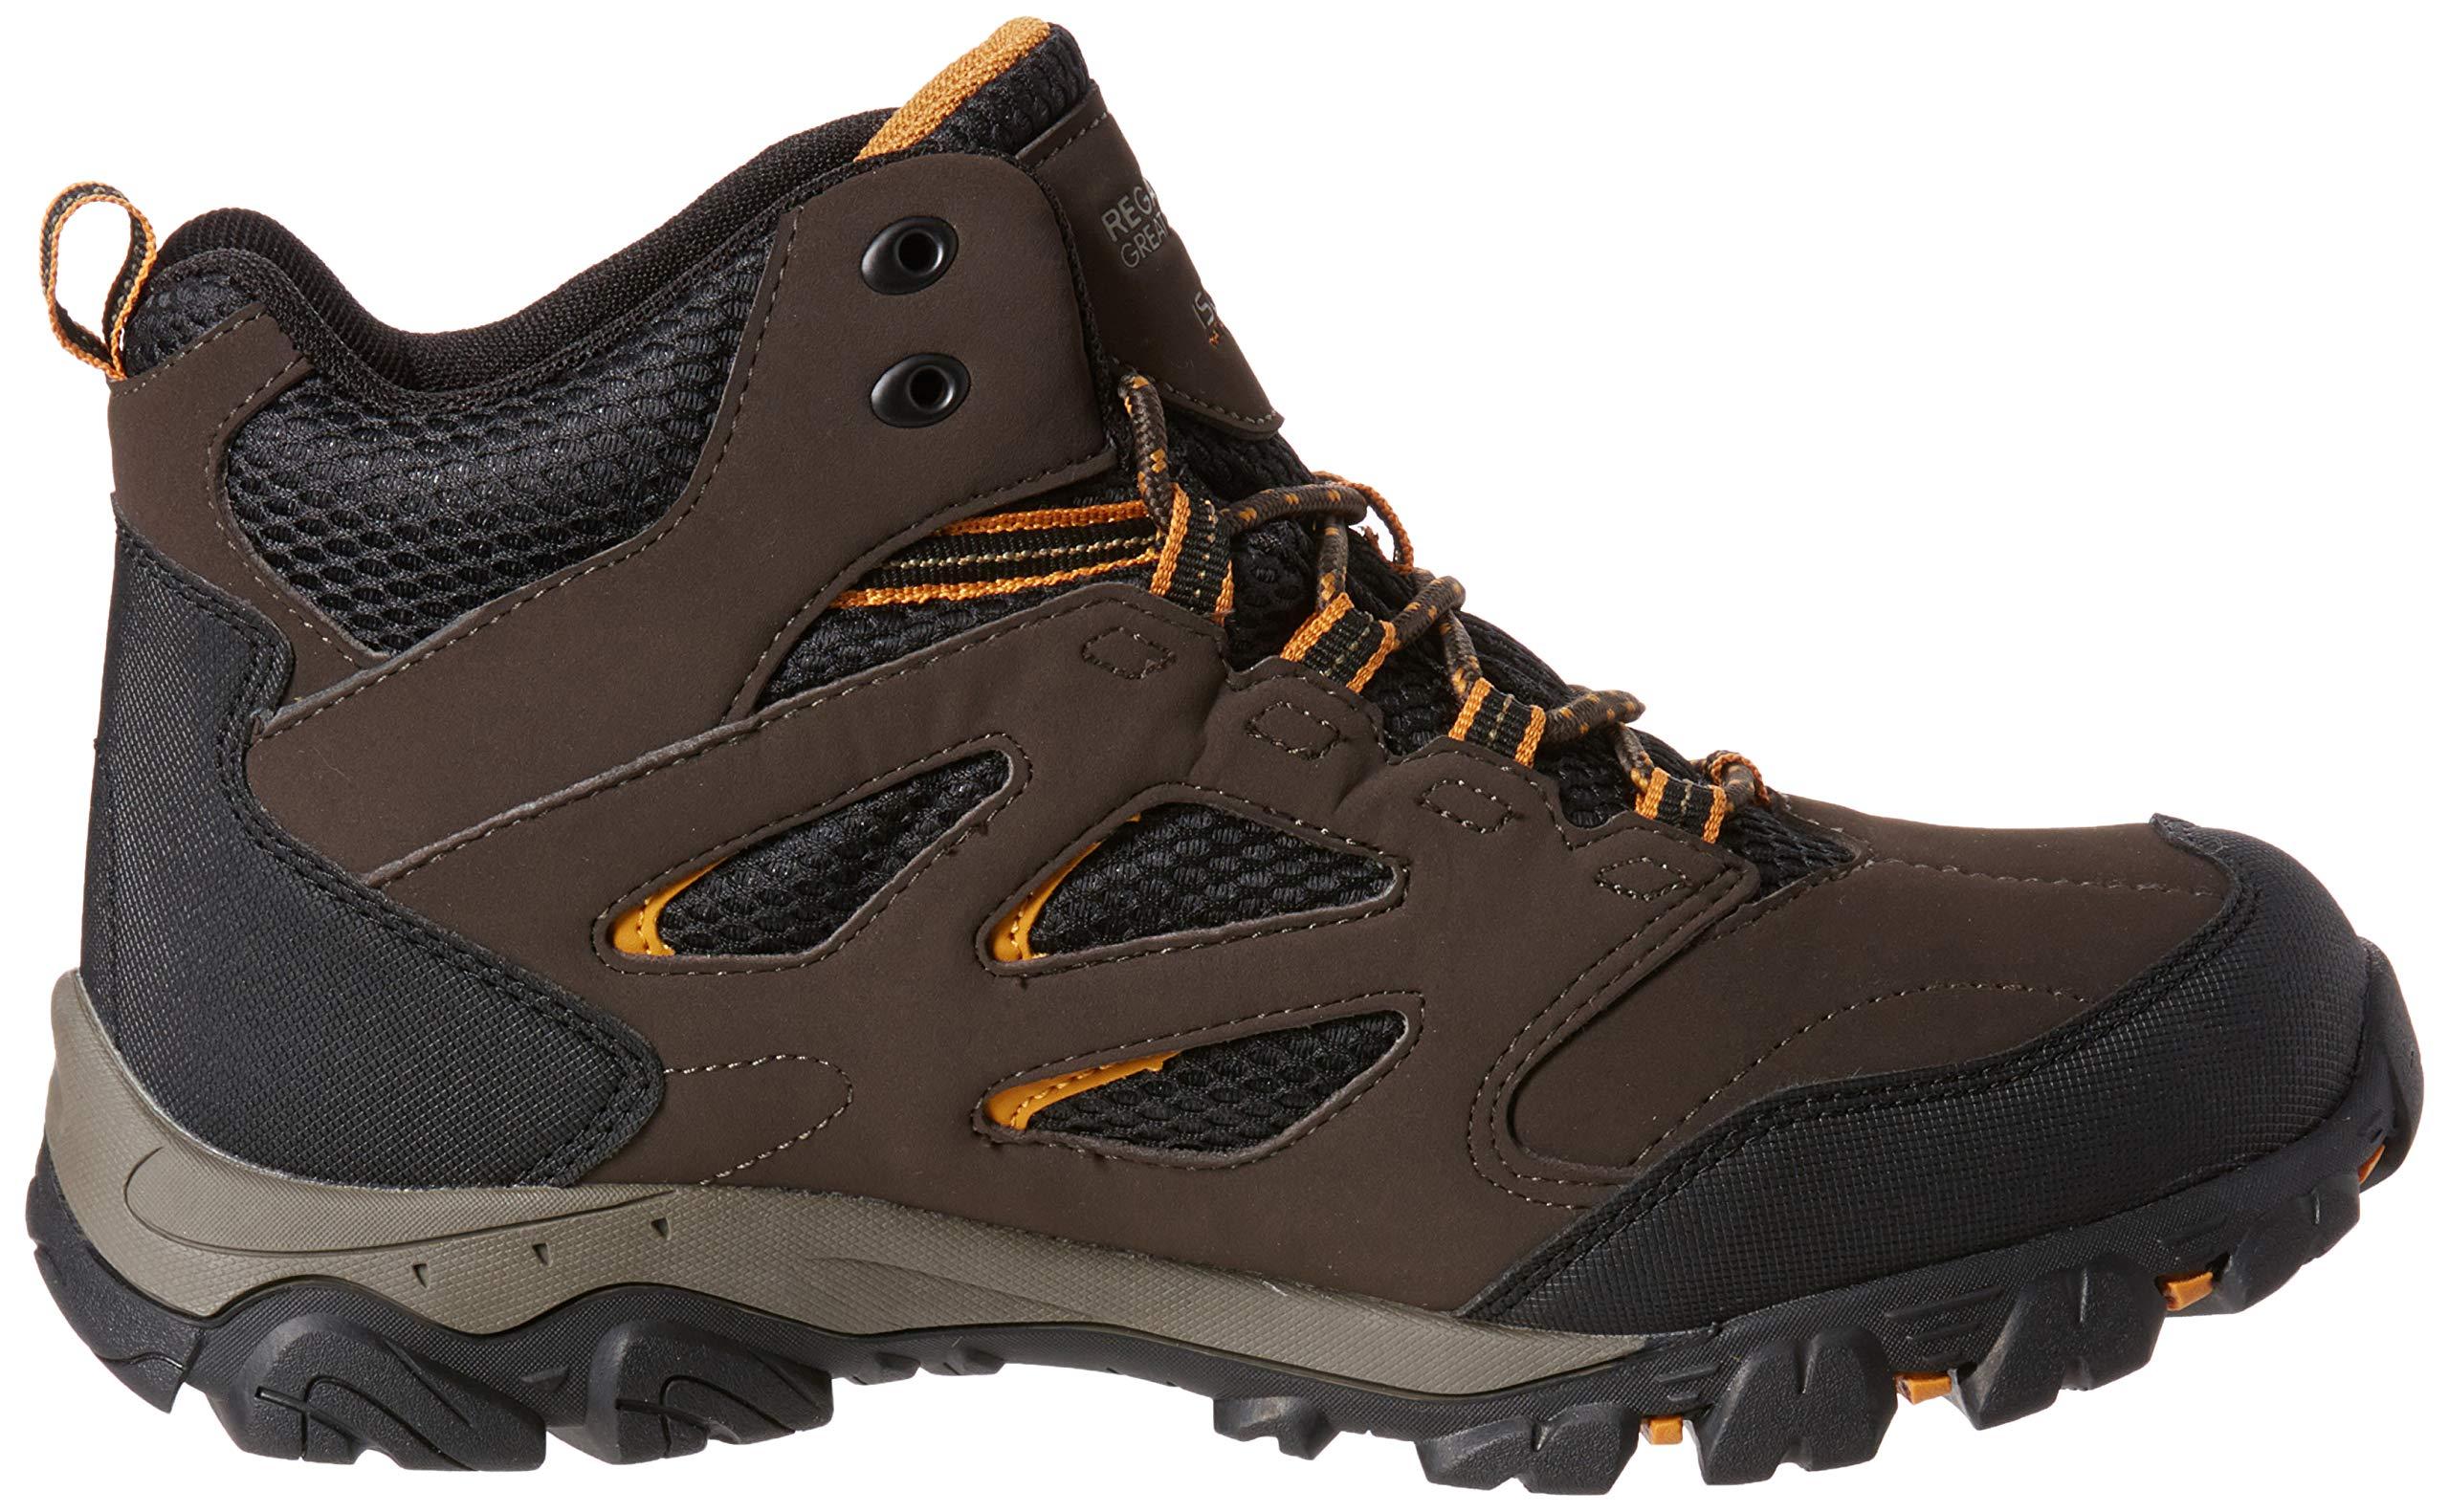 Regatta Men's Holcombe IEP Mid High Rise Hiking Boots 6